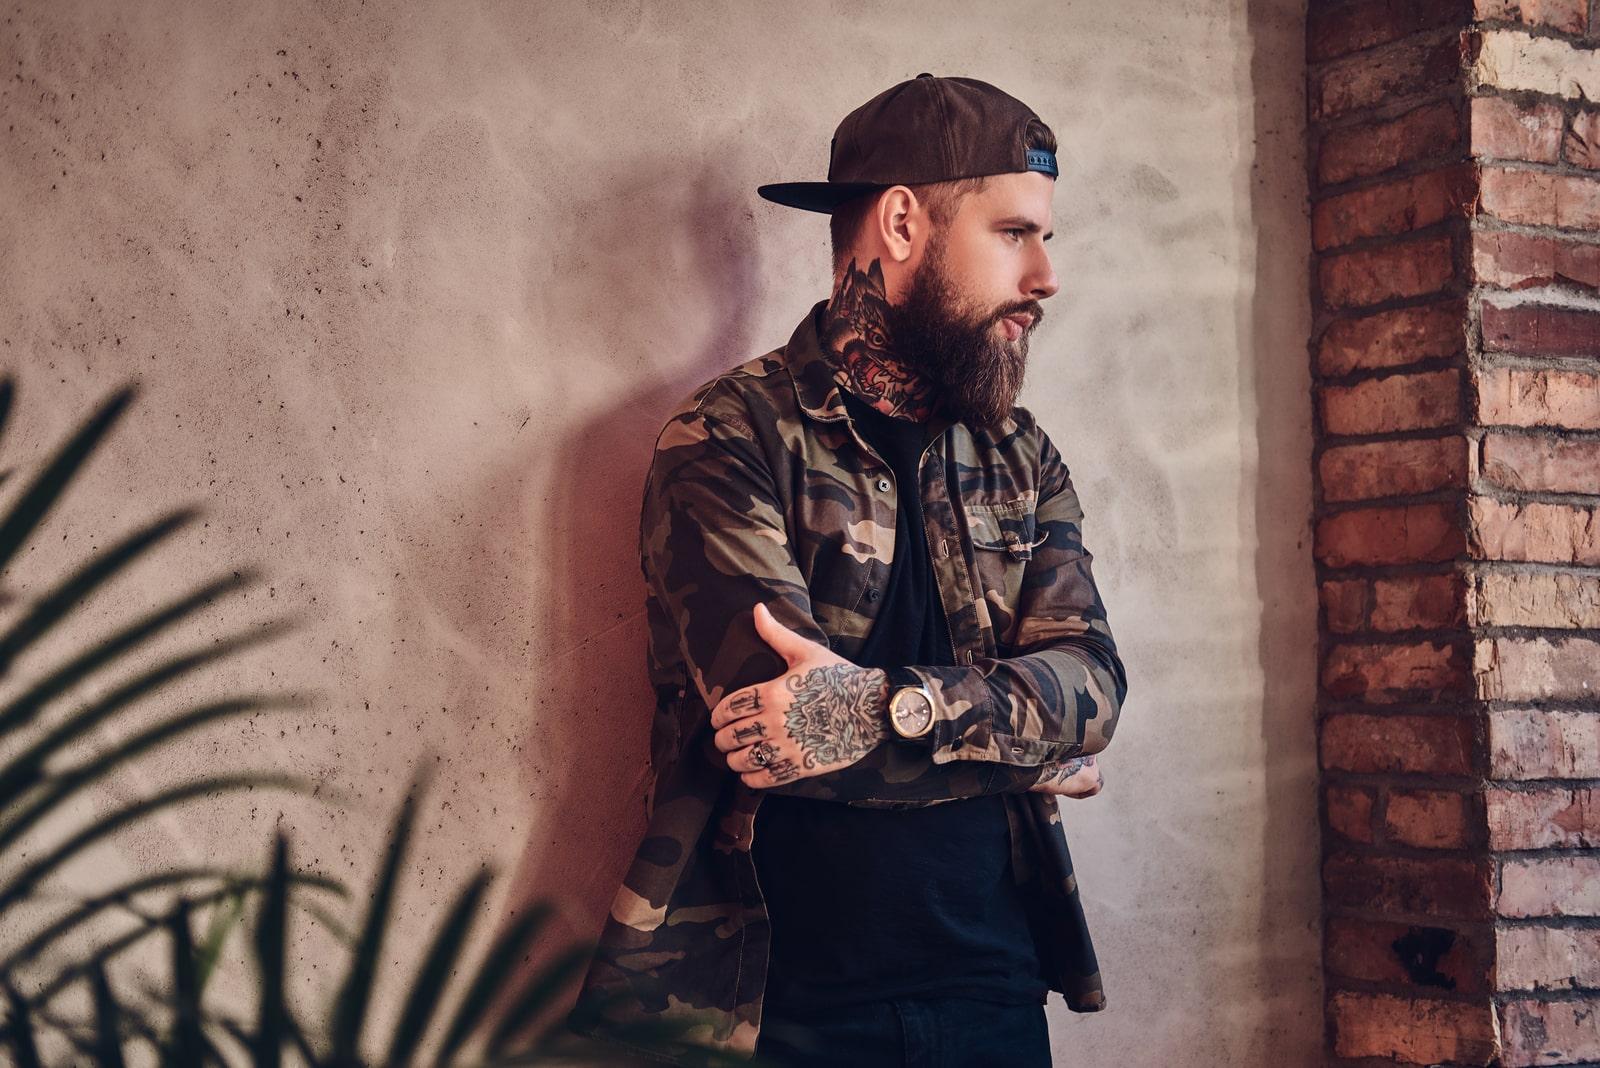 tattooed bearded man standing alone